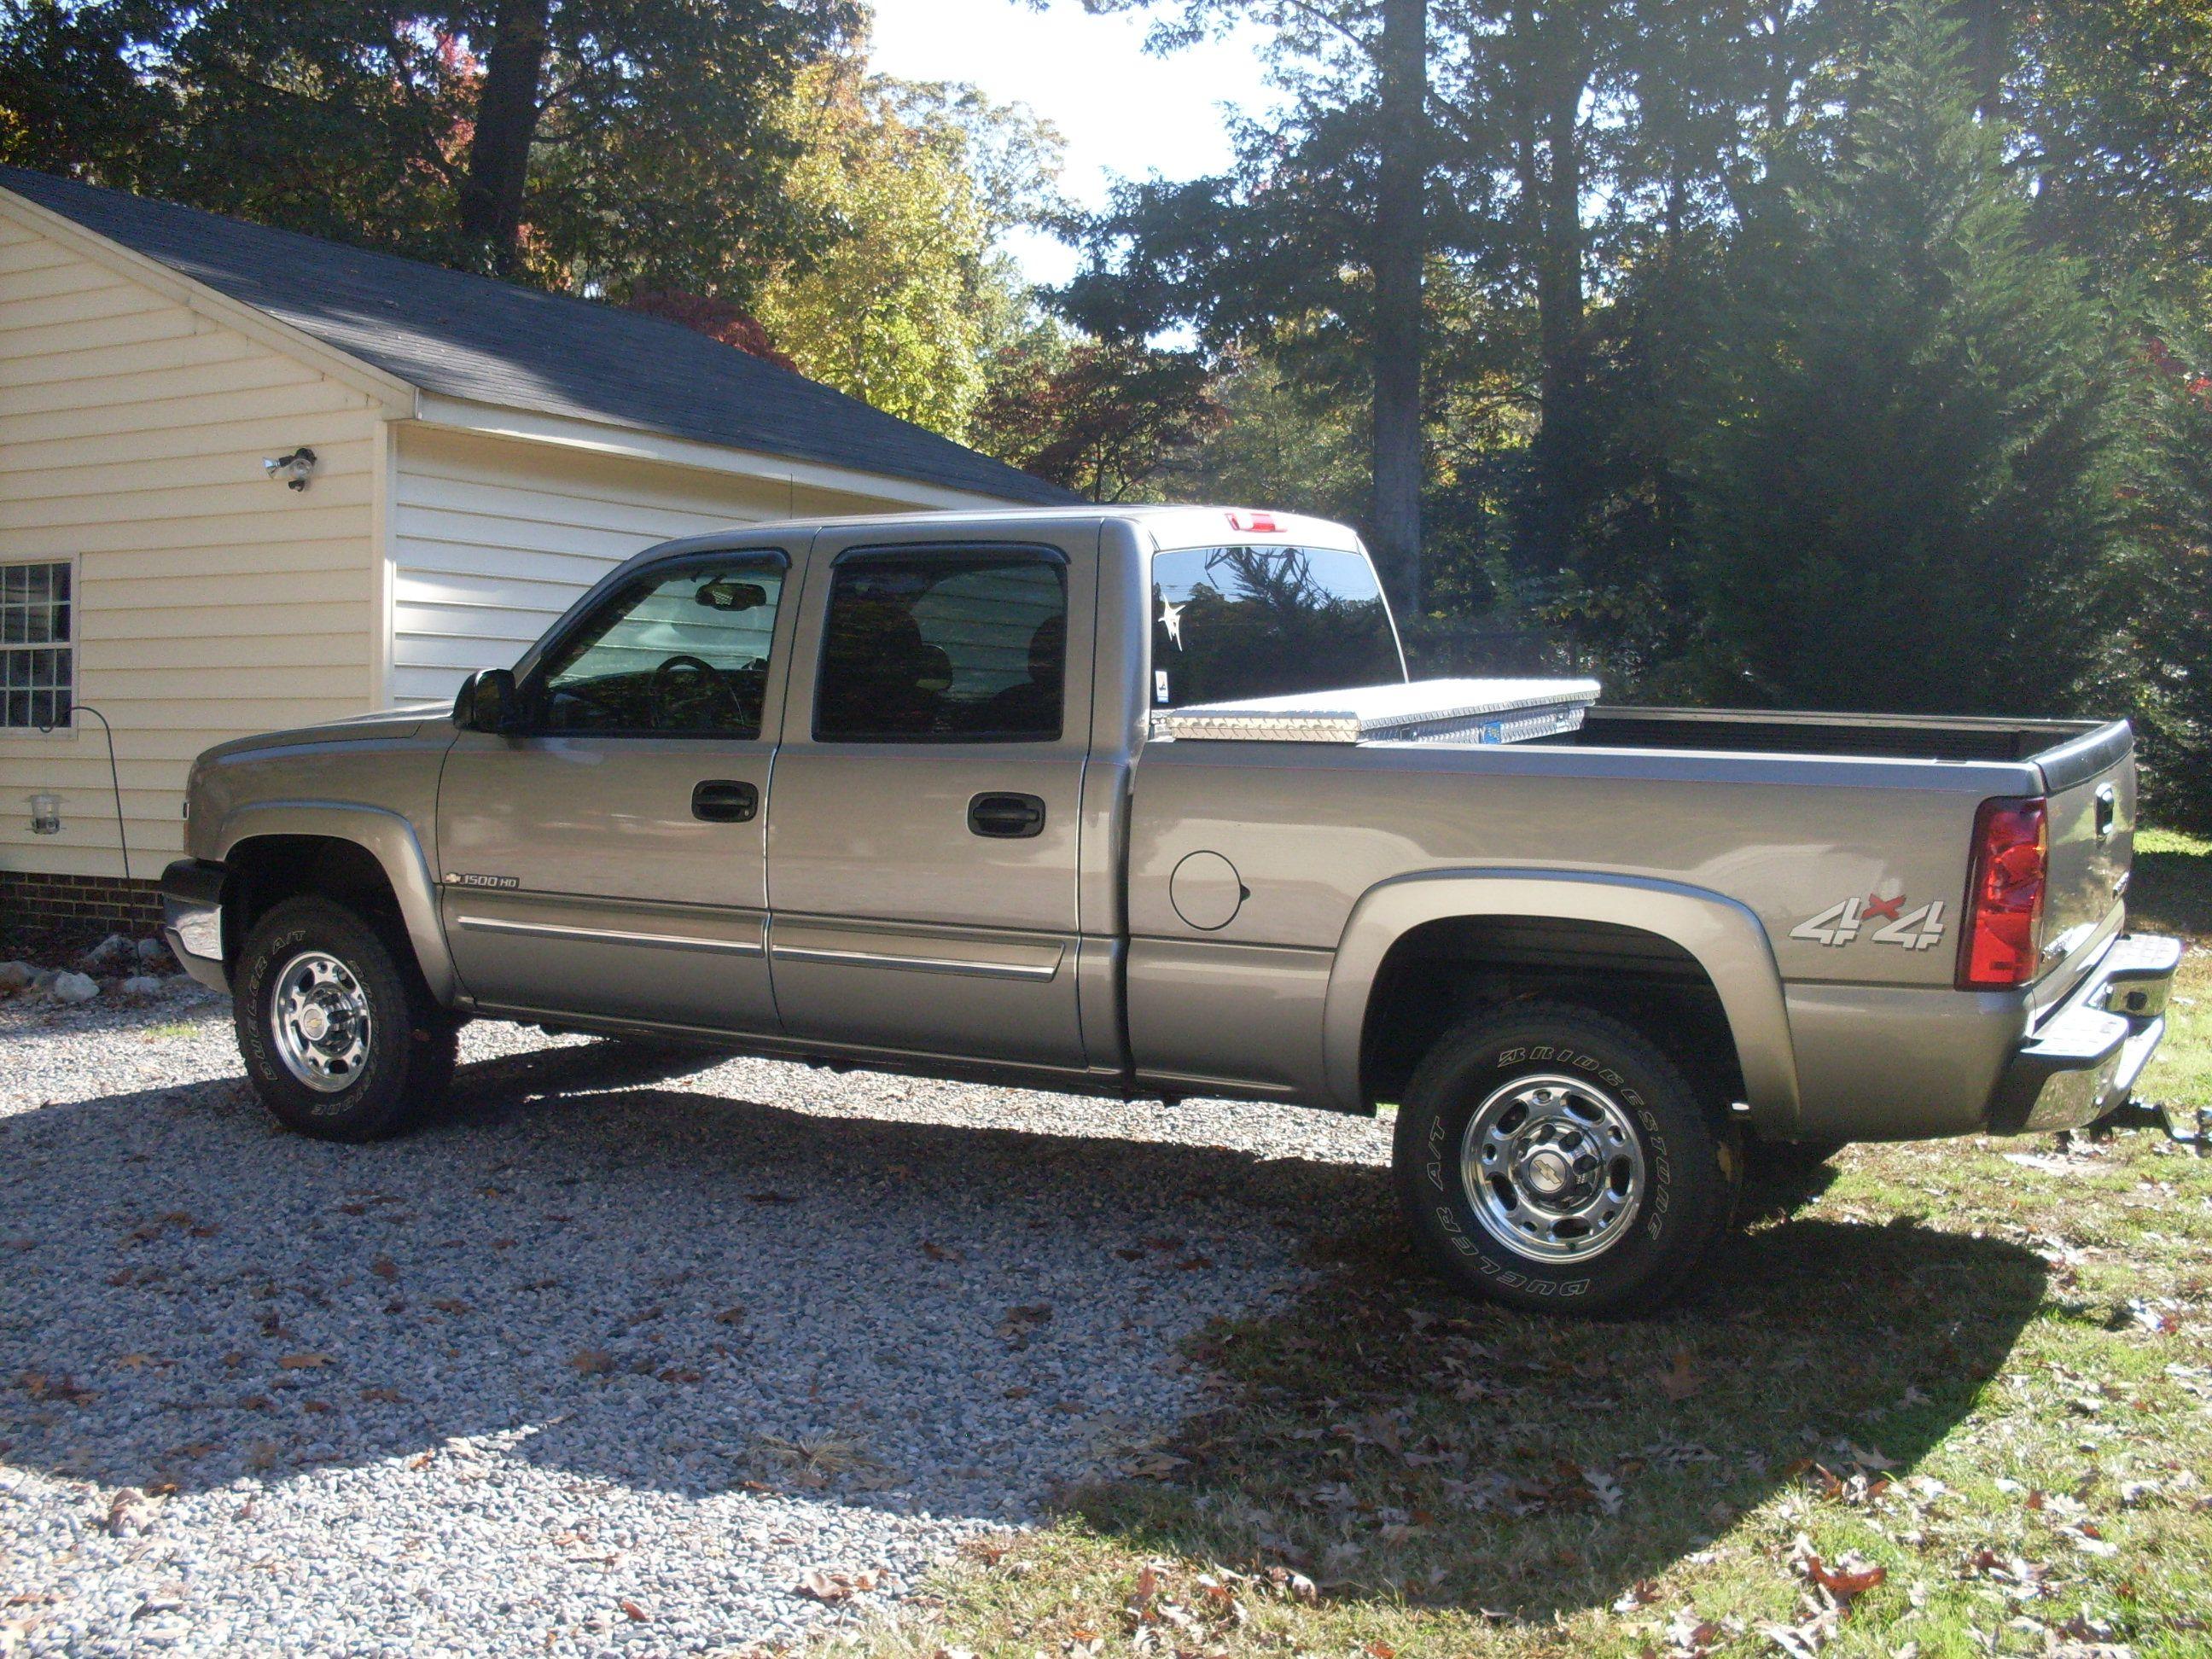 203561321493560 2003 Chevy Silverado 1500 Hd Pickup Truck Sdc10204